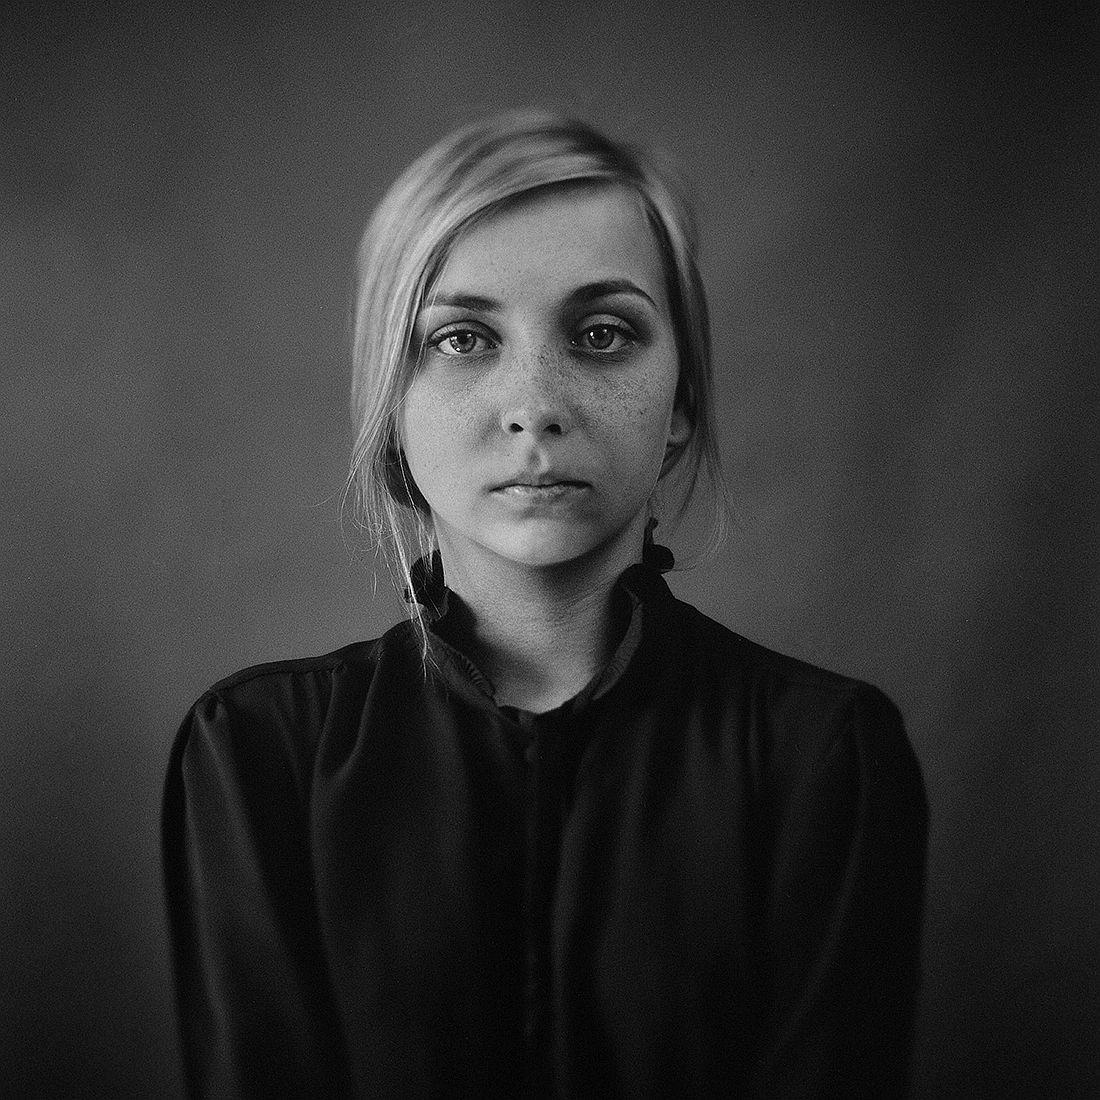 rafal-kazmierczak-nude-portrait-photographer-13